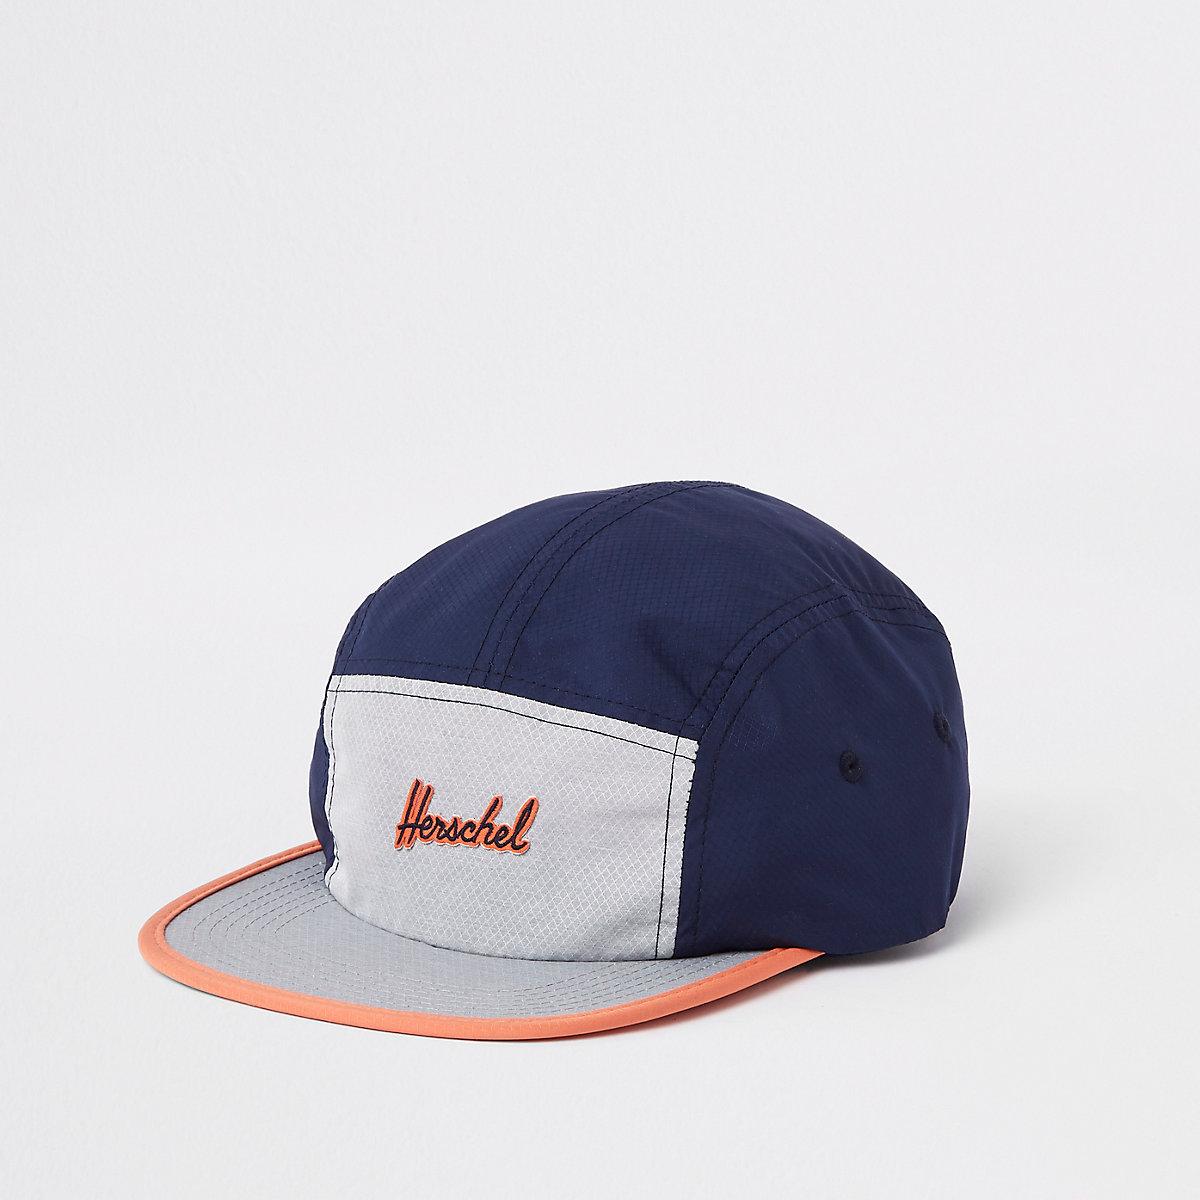 f796e5a2b09 Herschel navy Glendale cap - Hats   Caps - Accessories - men